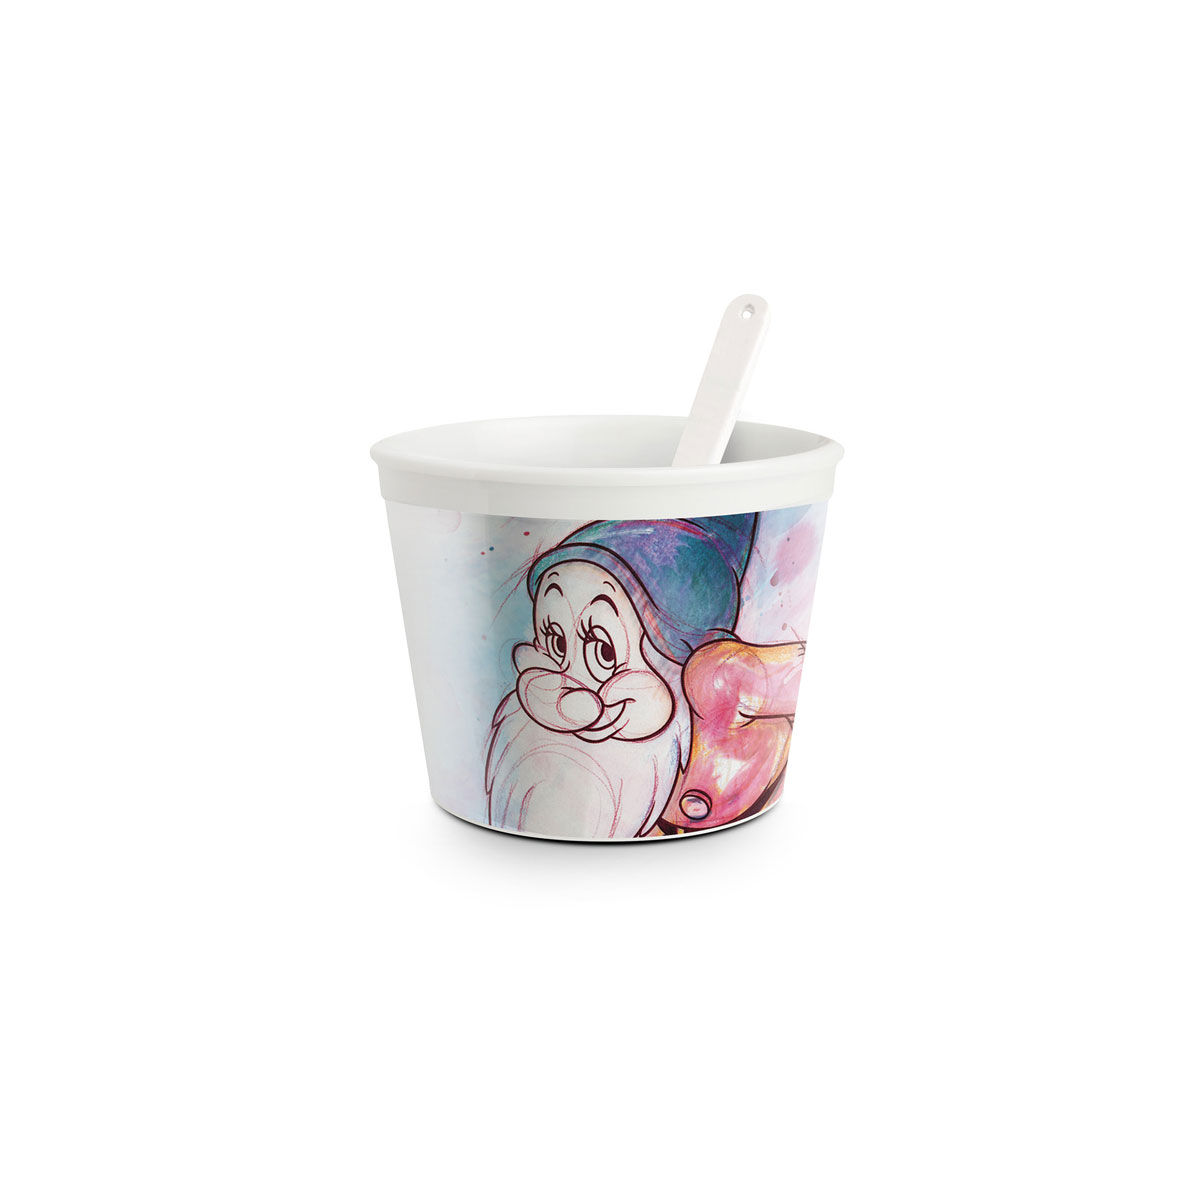 Ice Cream Bashful Cup With Spoon 7 Dwarfs - Disney Home